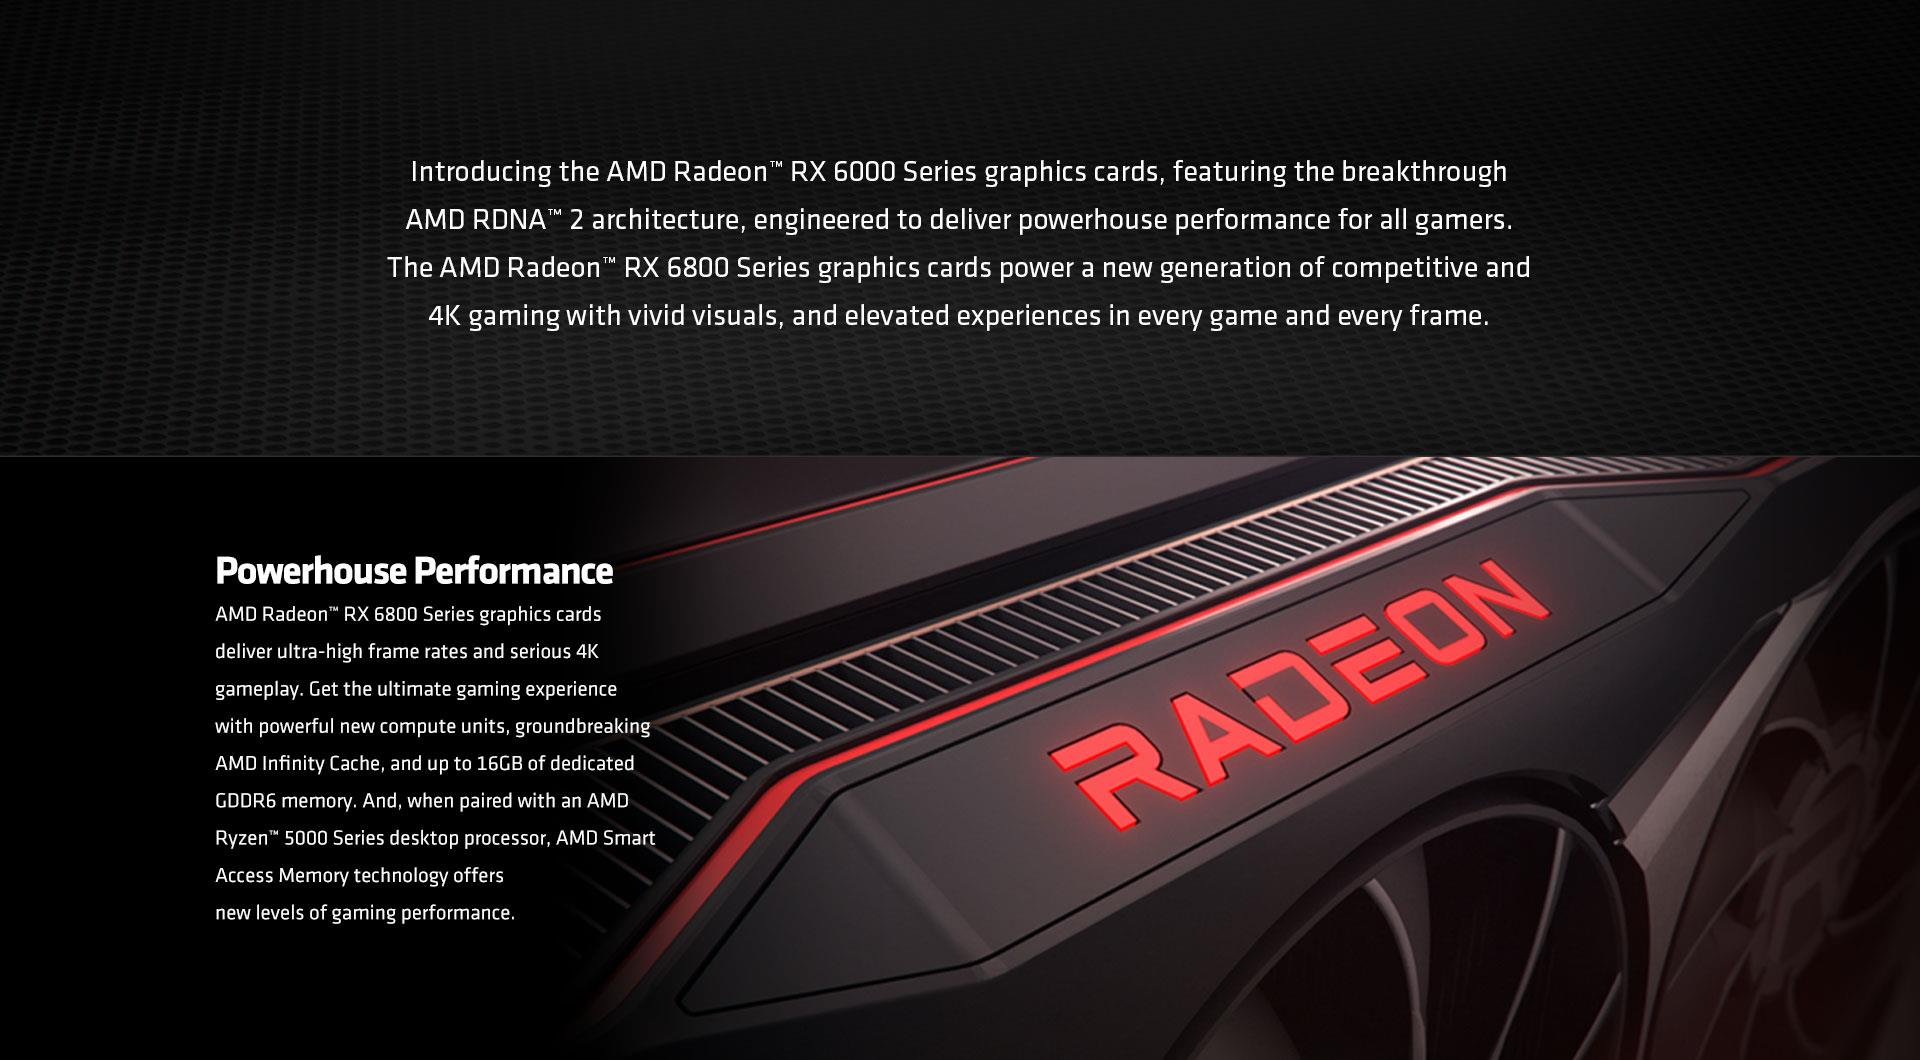 SAPPHIRE PULSE AMD RADEON RX 6800 OC